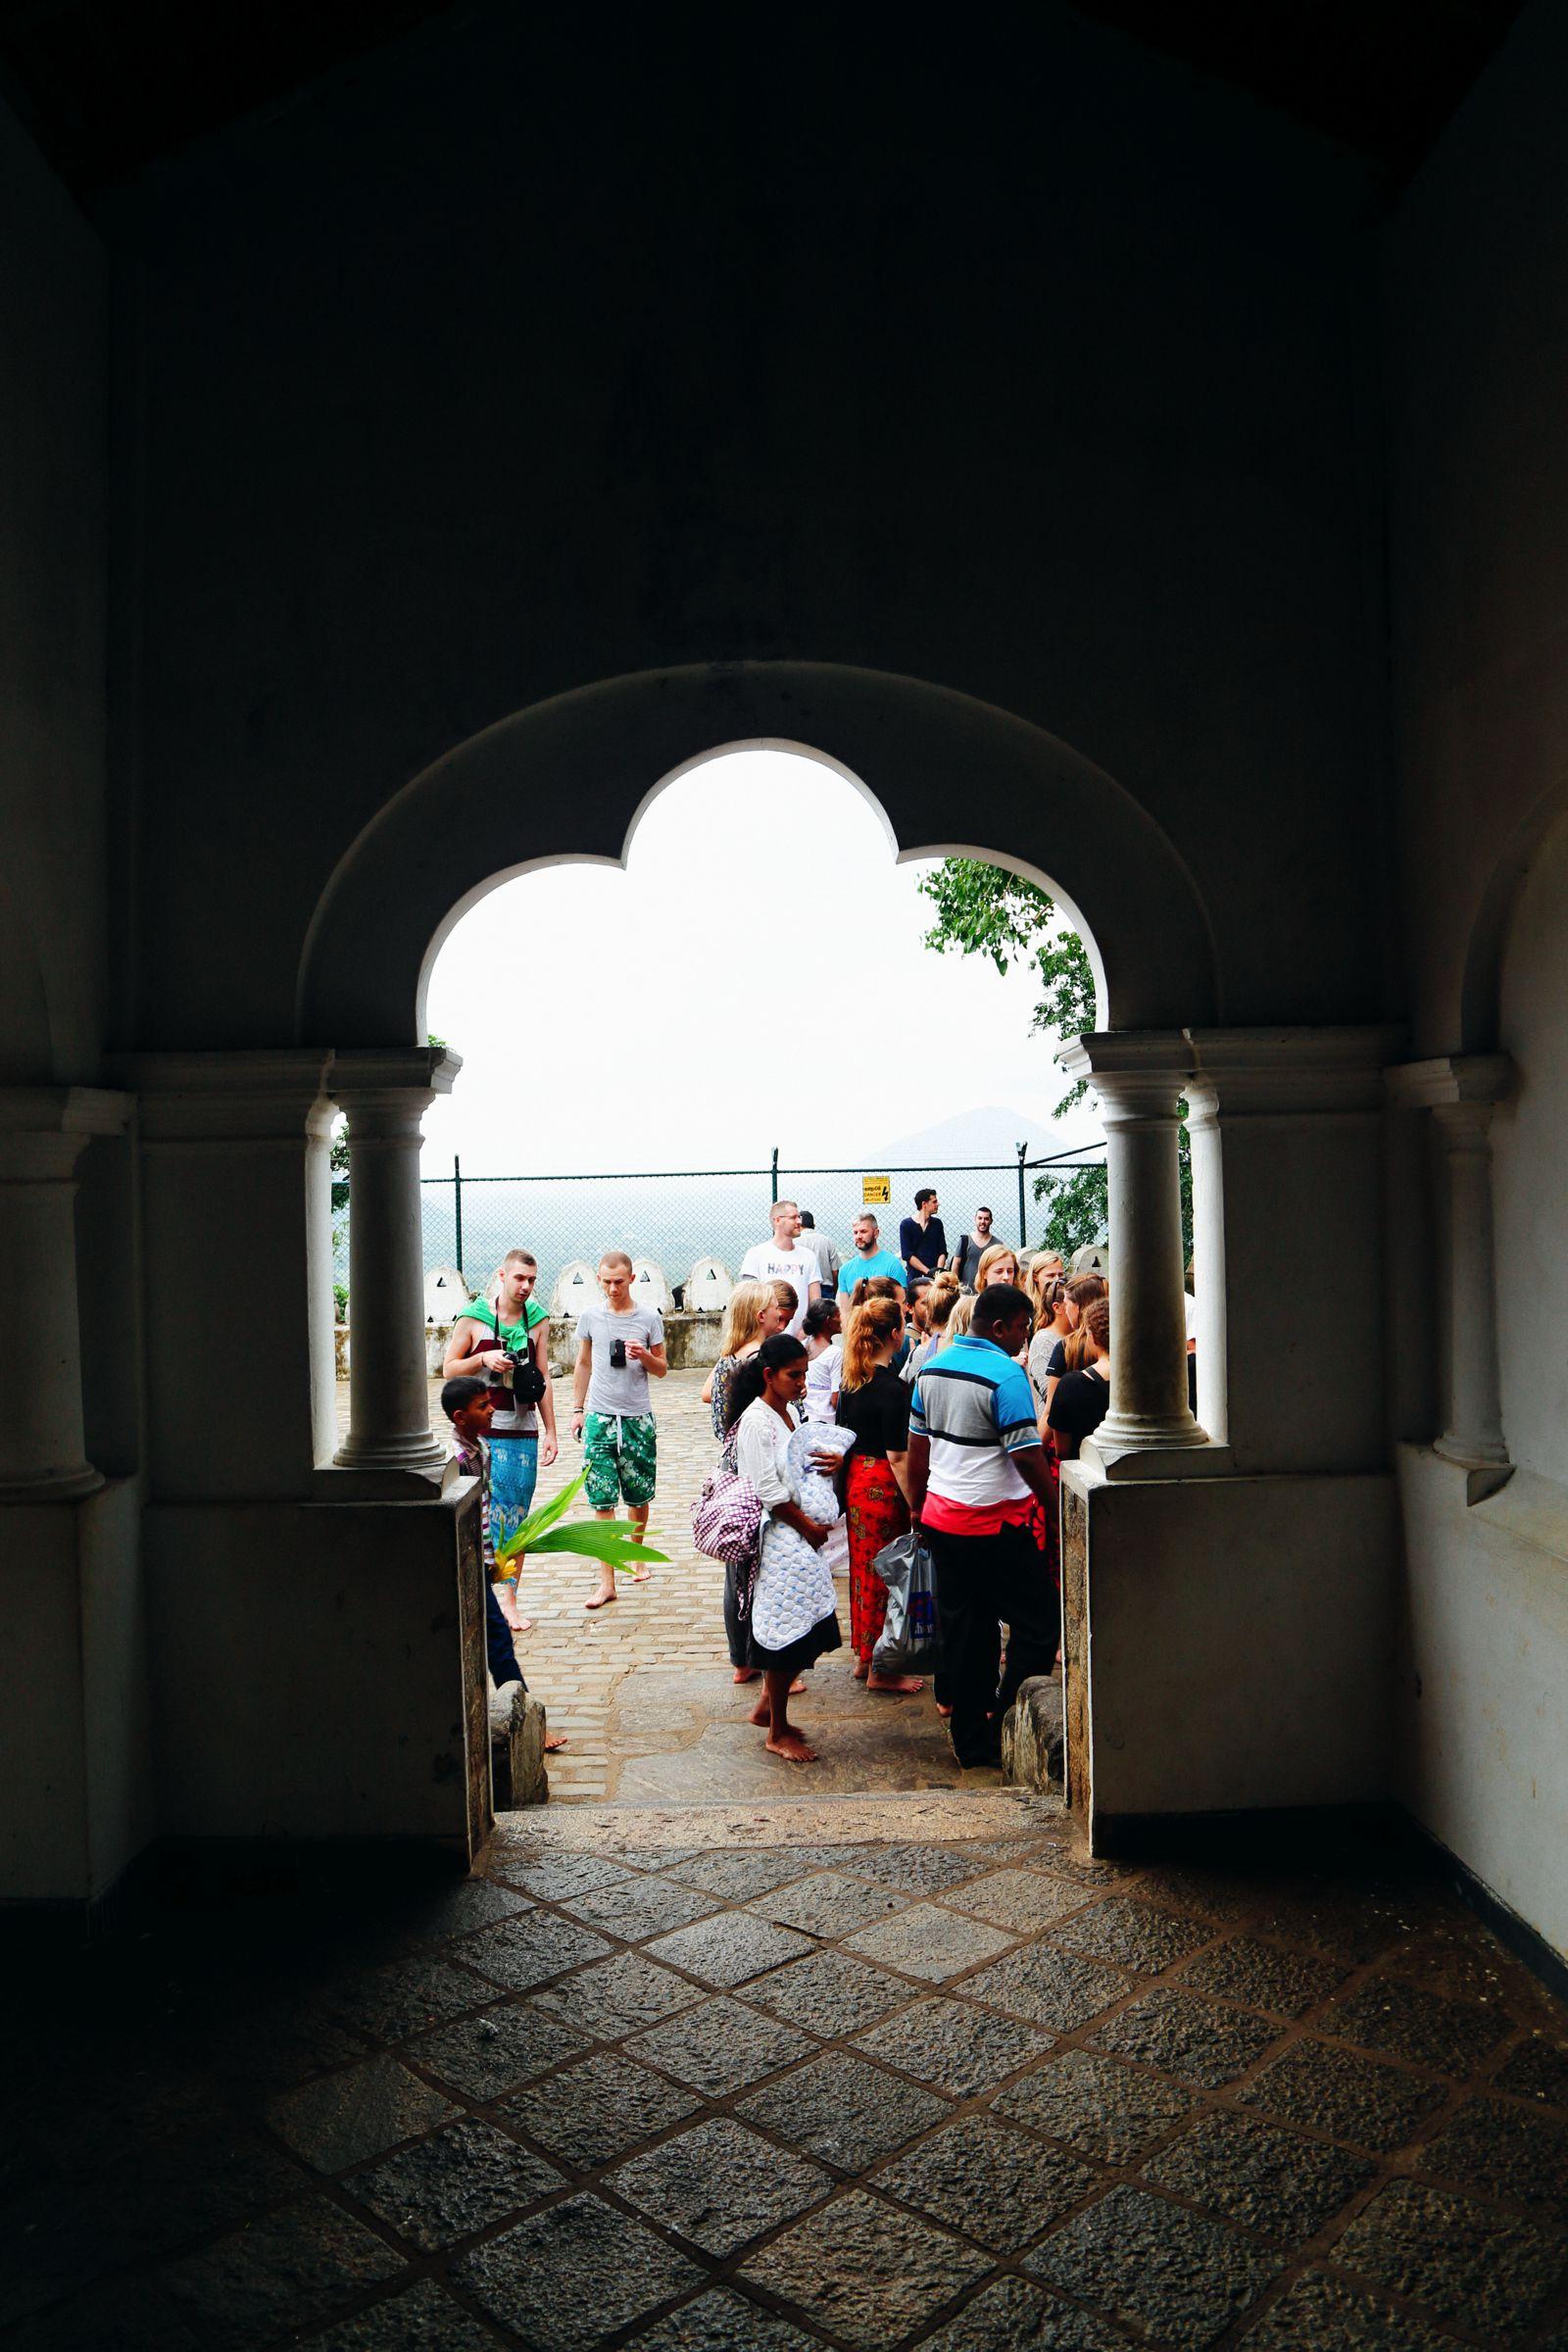 Dambulla Cave Temple And A Trip To Kandy, Sri Lanka (15)